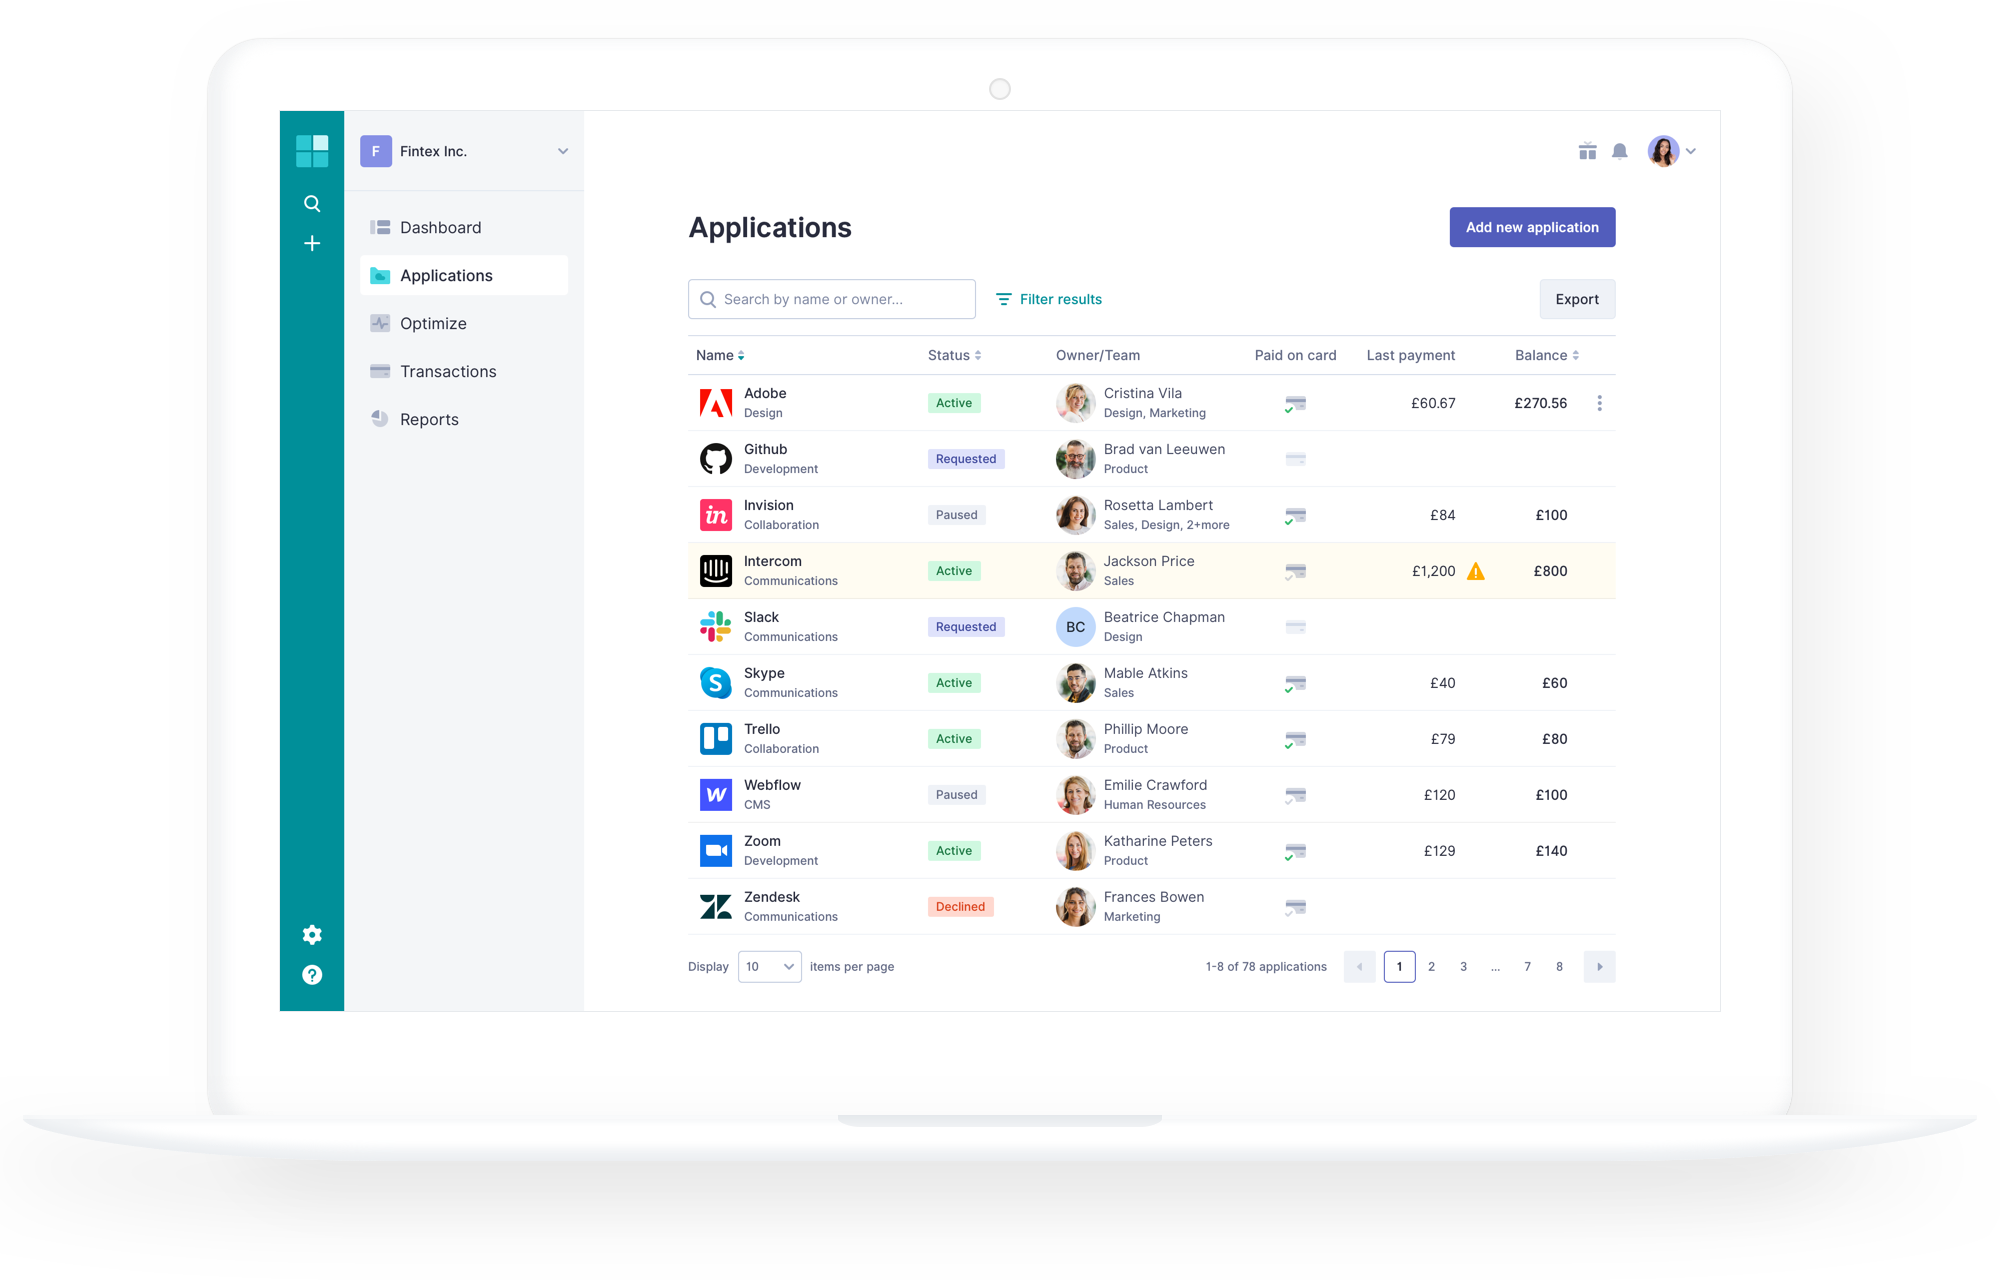 Manage Applications screenshot